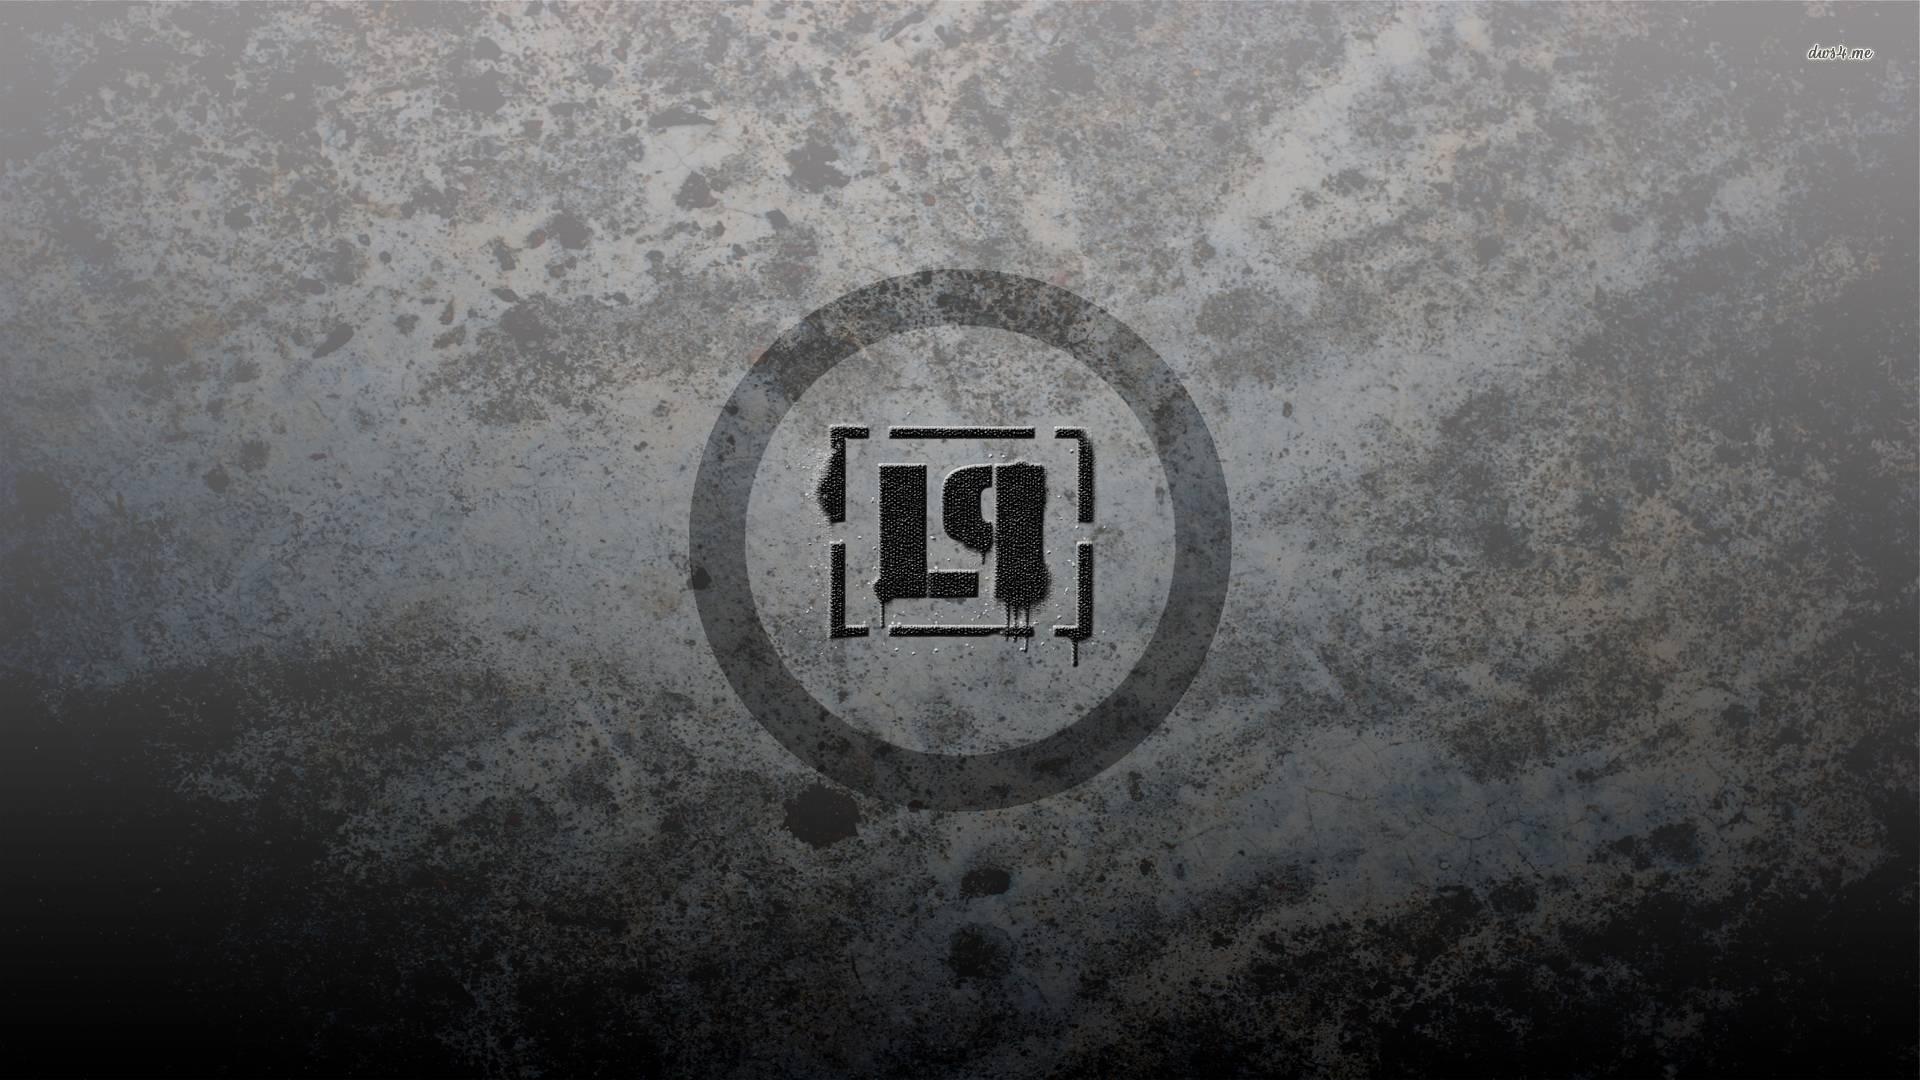 Linkin Park Logo Wallpapers 2015